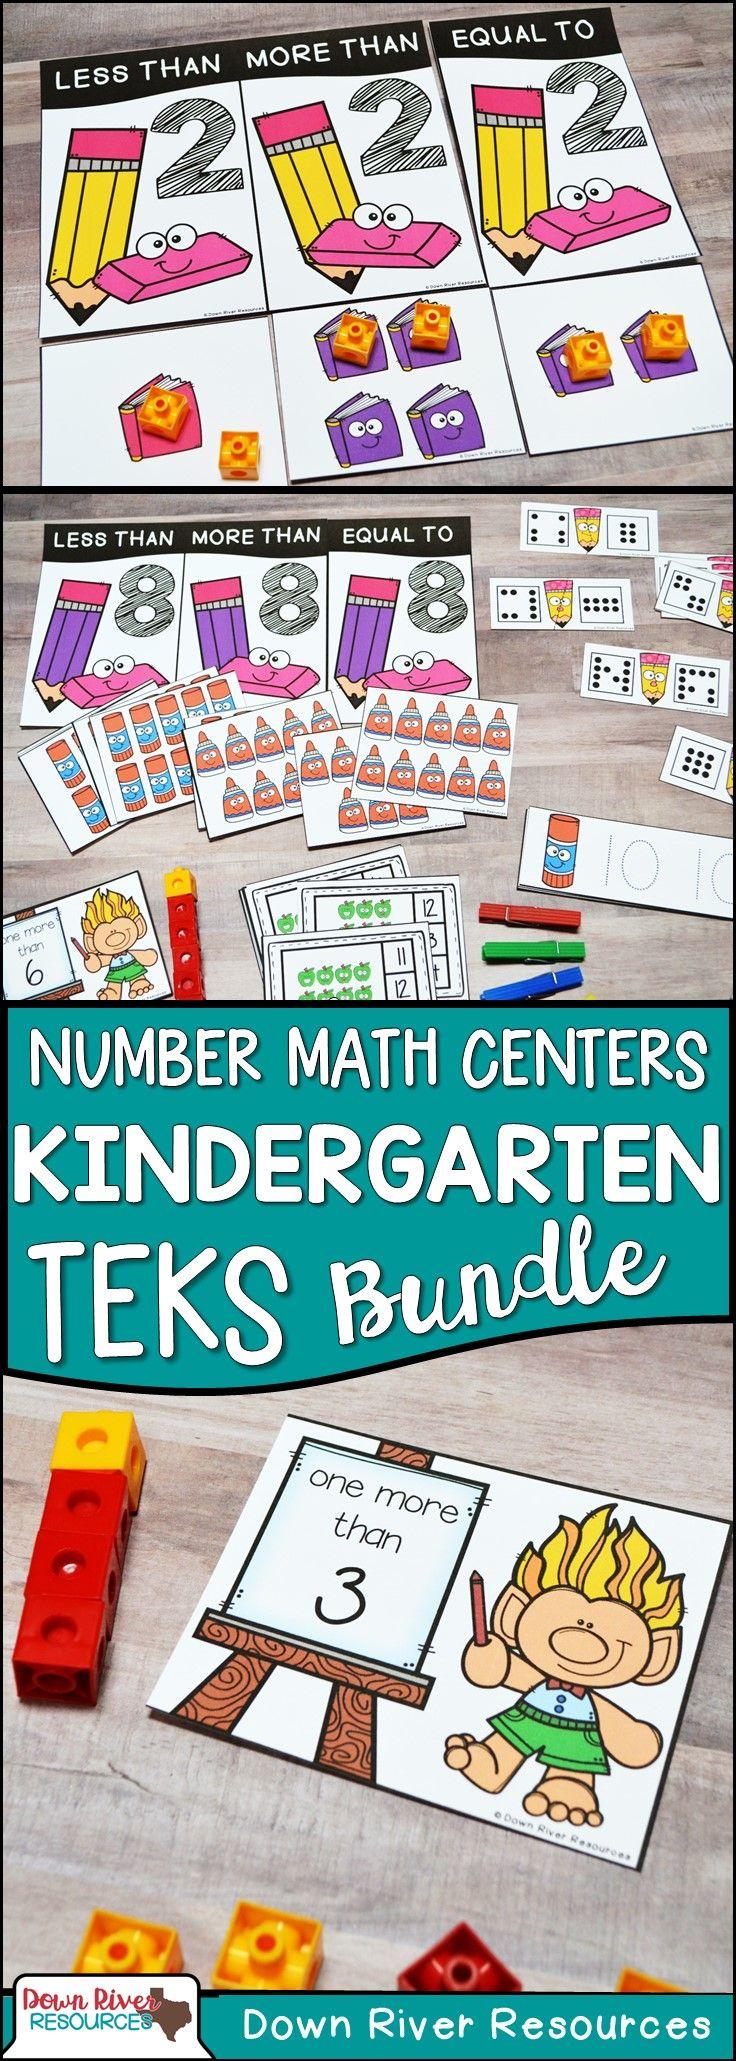 Kindergarten Math Centers | Kindergarten Math Stations | Kindergarten Math TEKS | Whole Numbers 0-20 | Numbers 0-20 | Comparing Numbers | Read, Write, and Represent Numbers up to 20 | Compose and Decompose Numbers up to 10